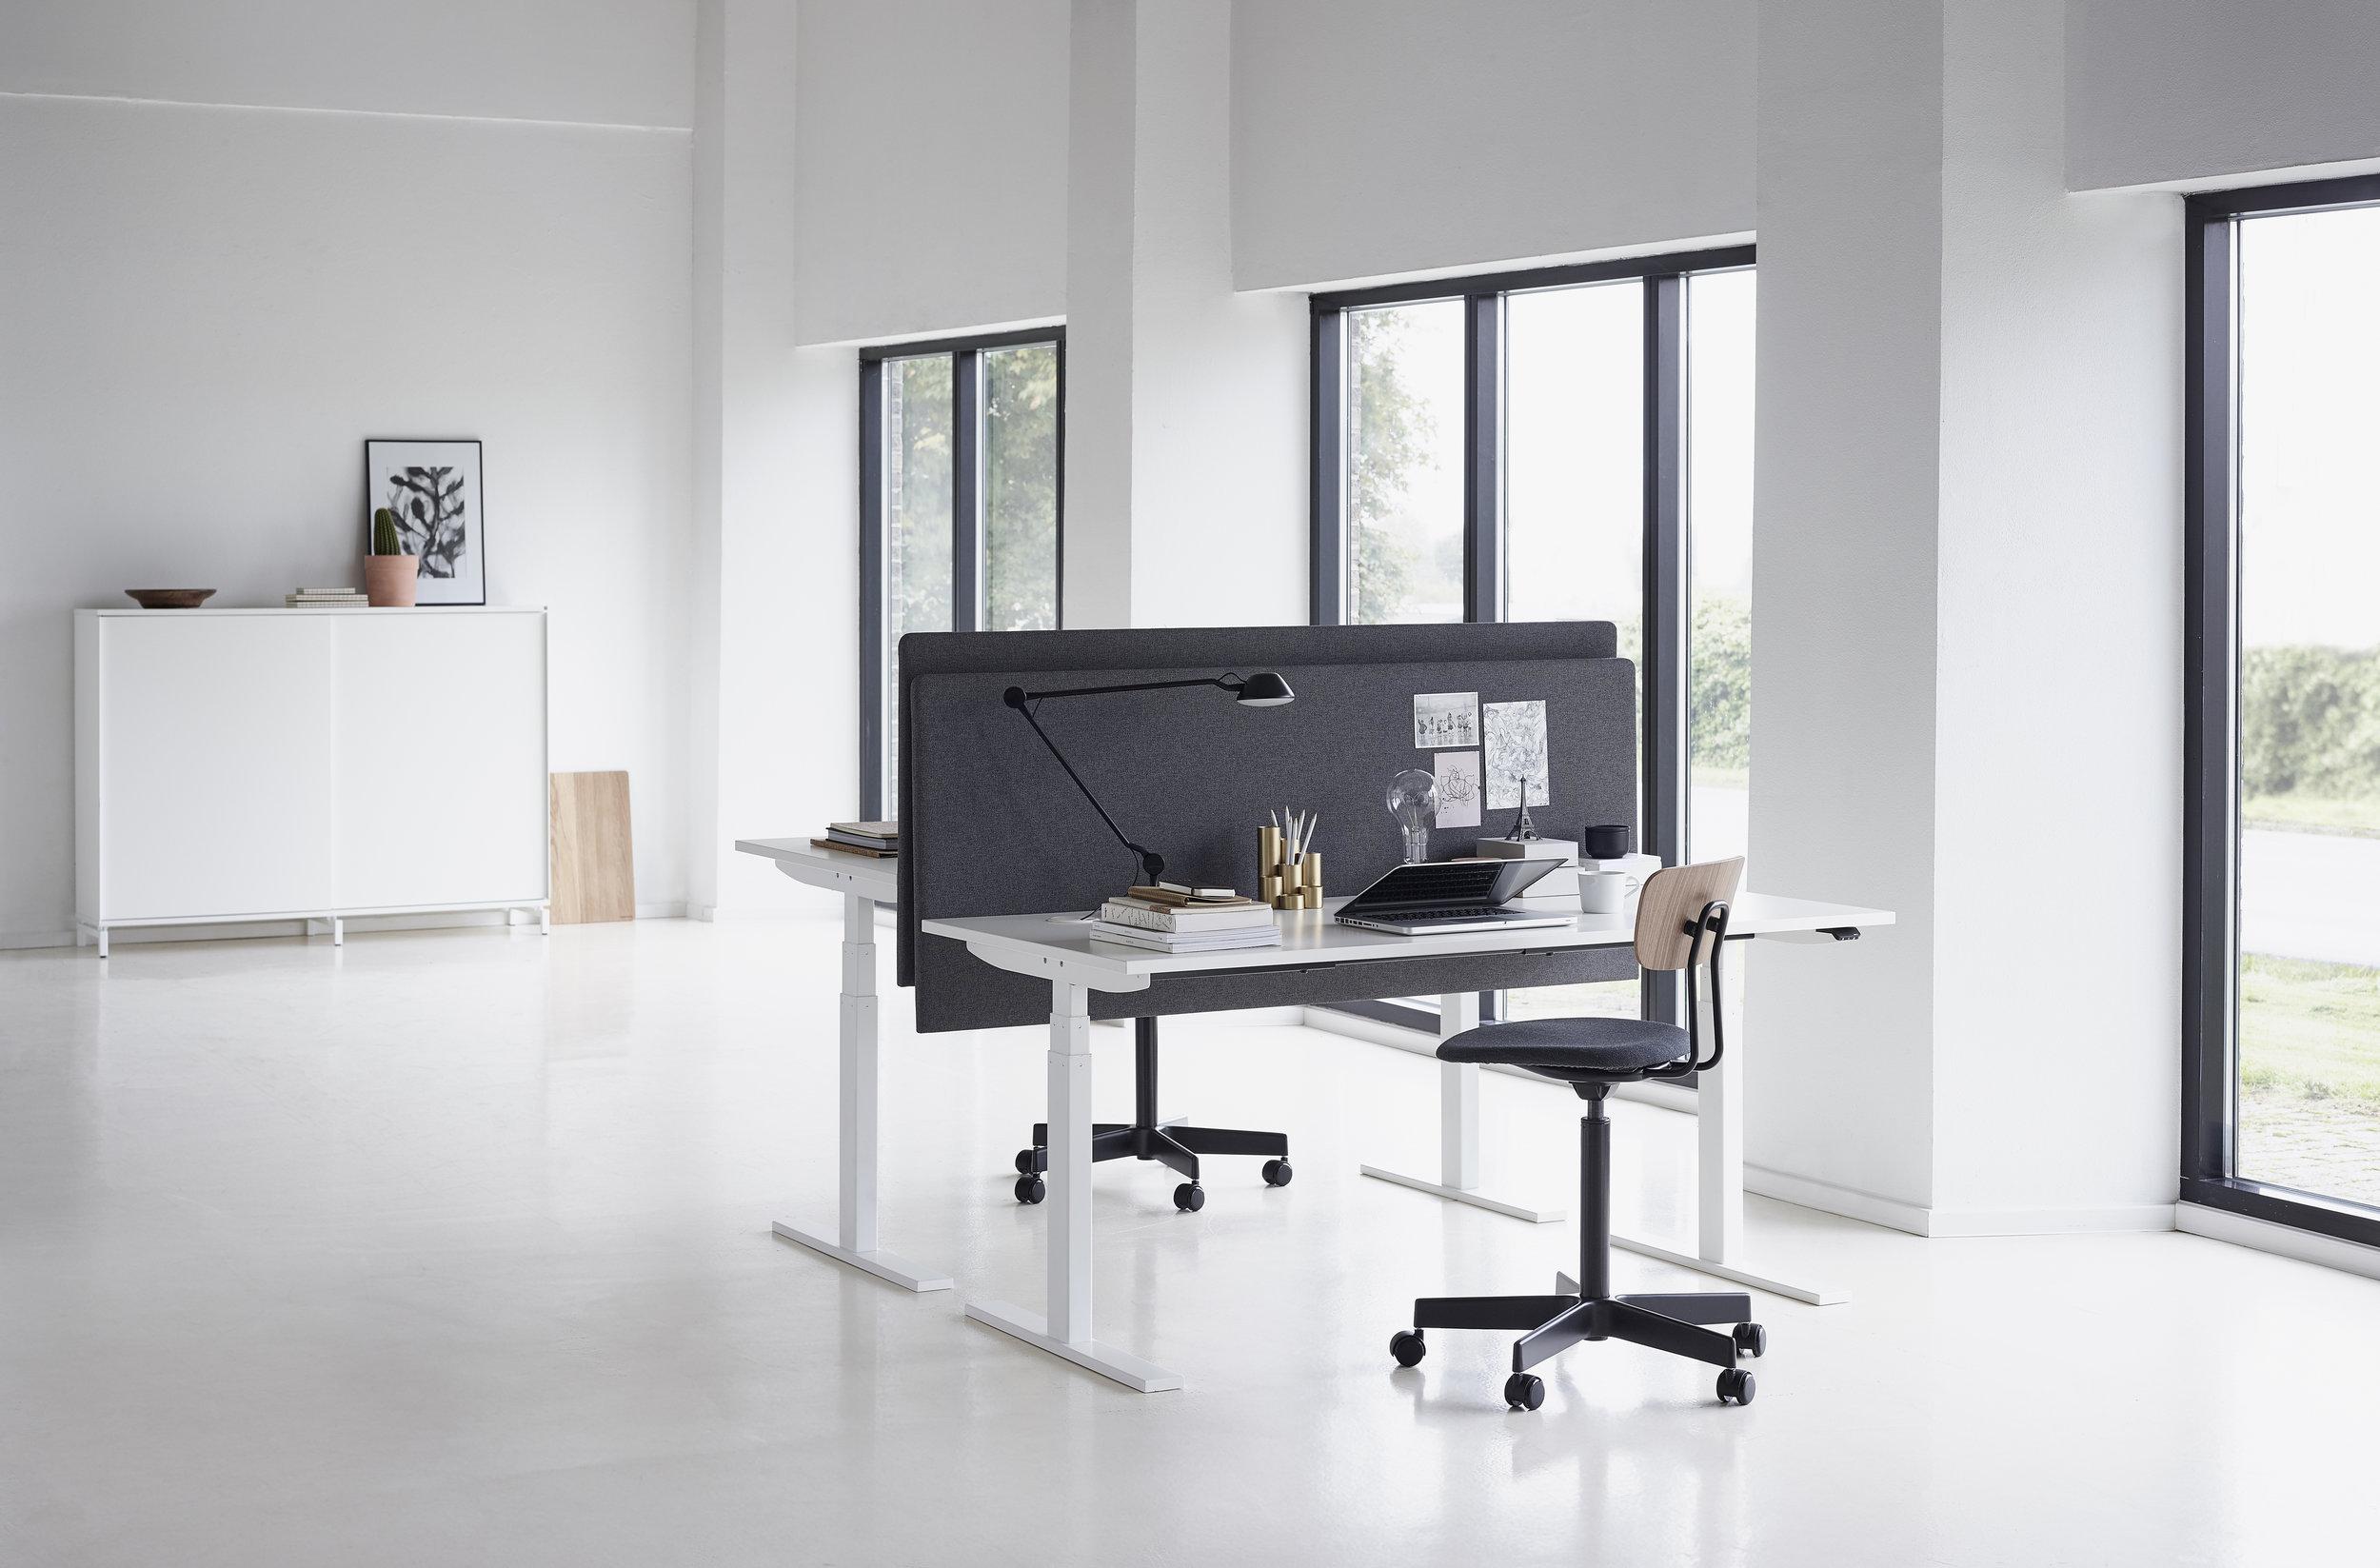 jeb_furniture_desking_holmris_Q20-ambient-01s.jpg